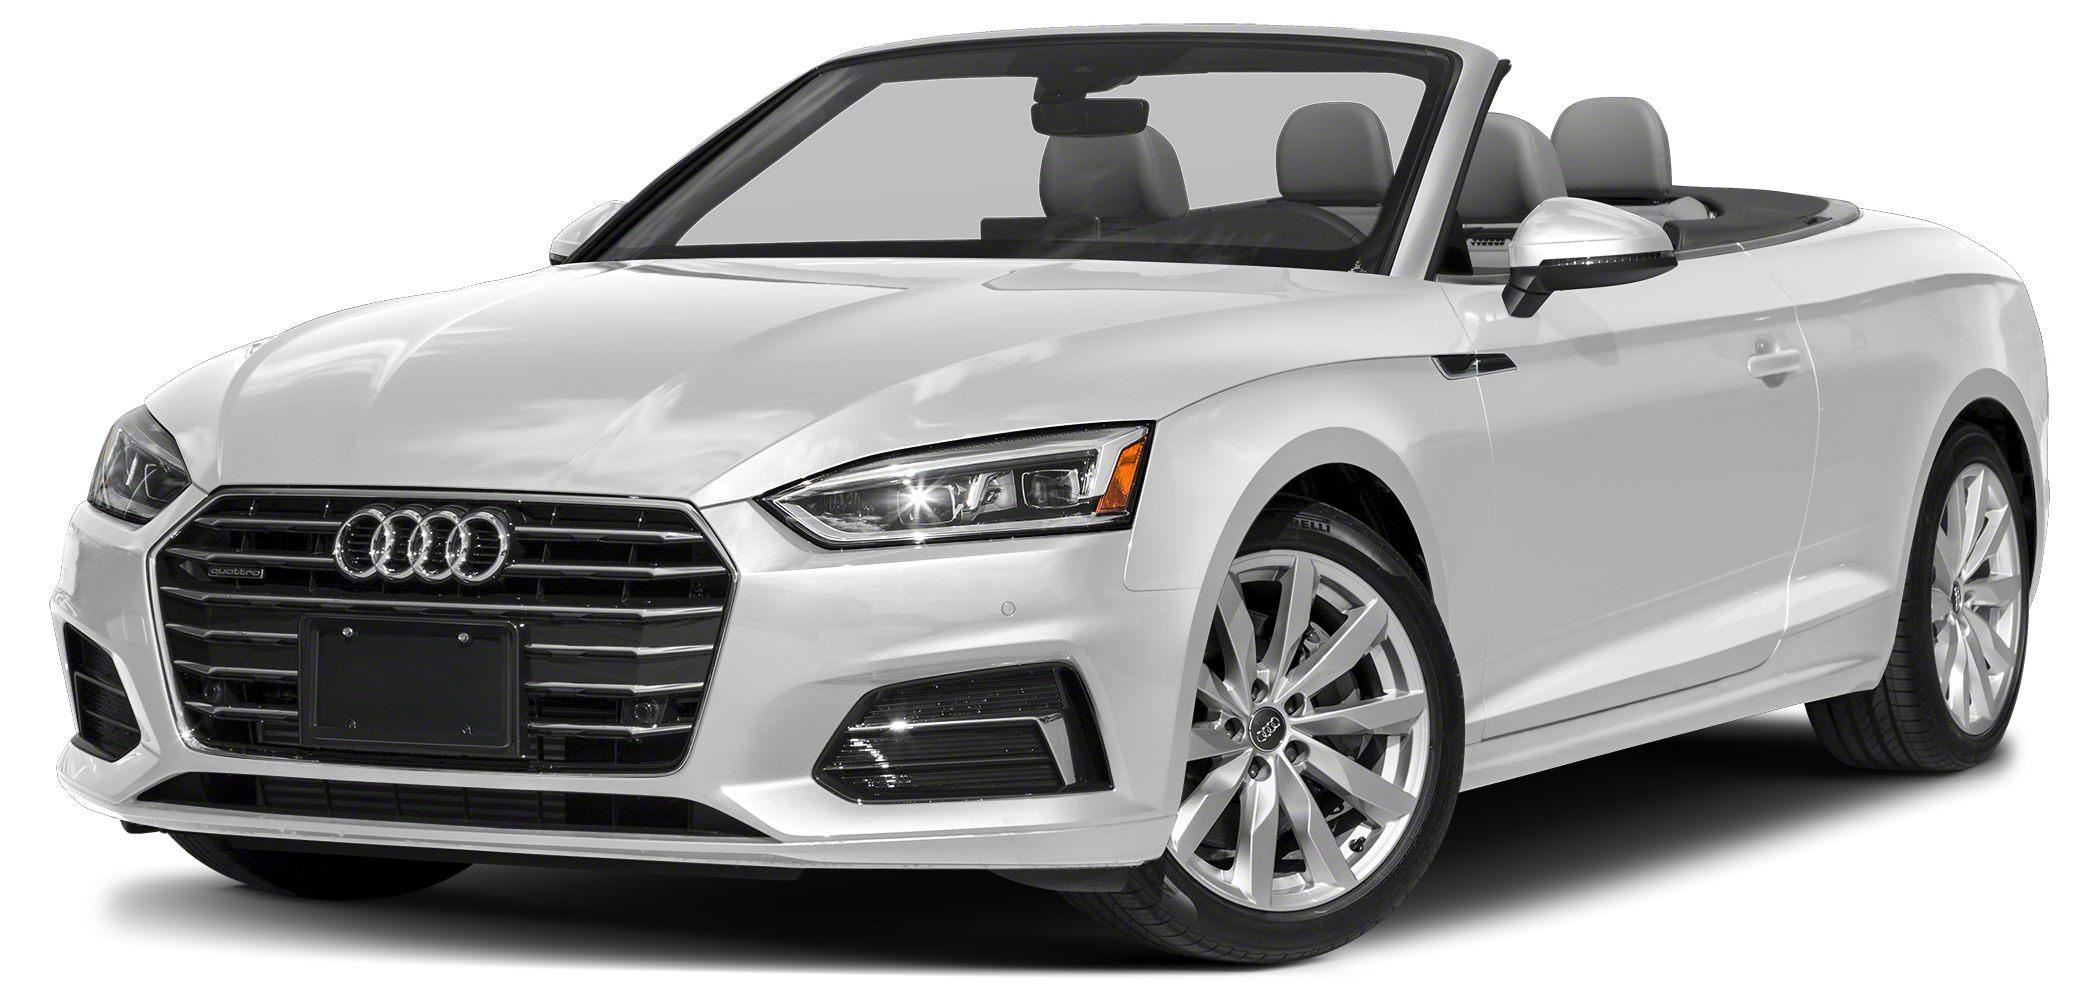 2018 Audi A5 20T quattro Premium Optional equipment includes Premium Plus Navigation Package L